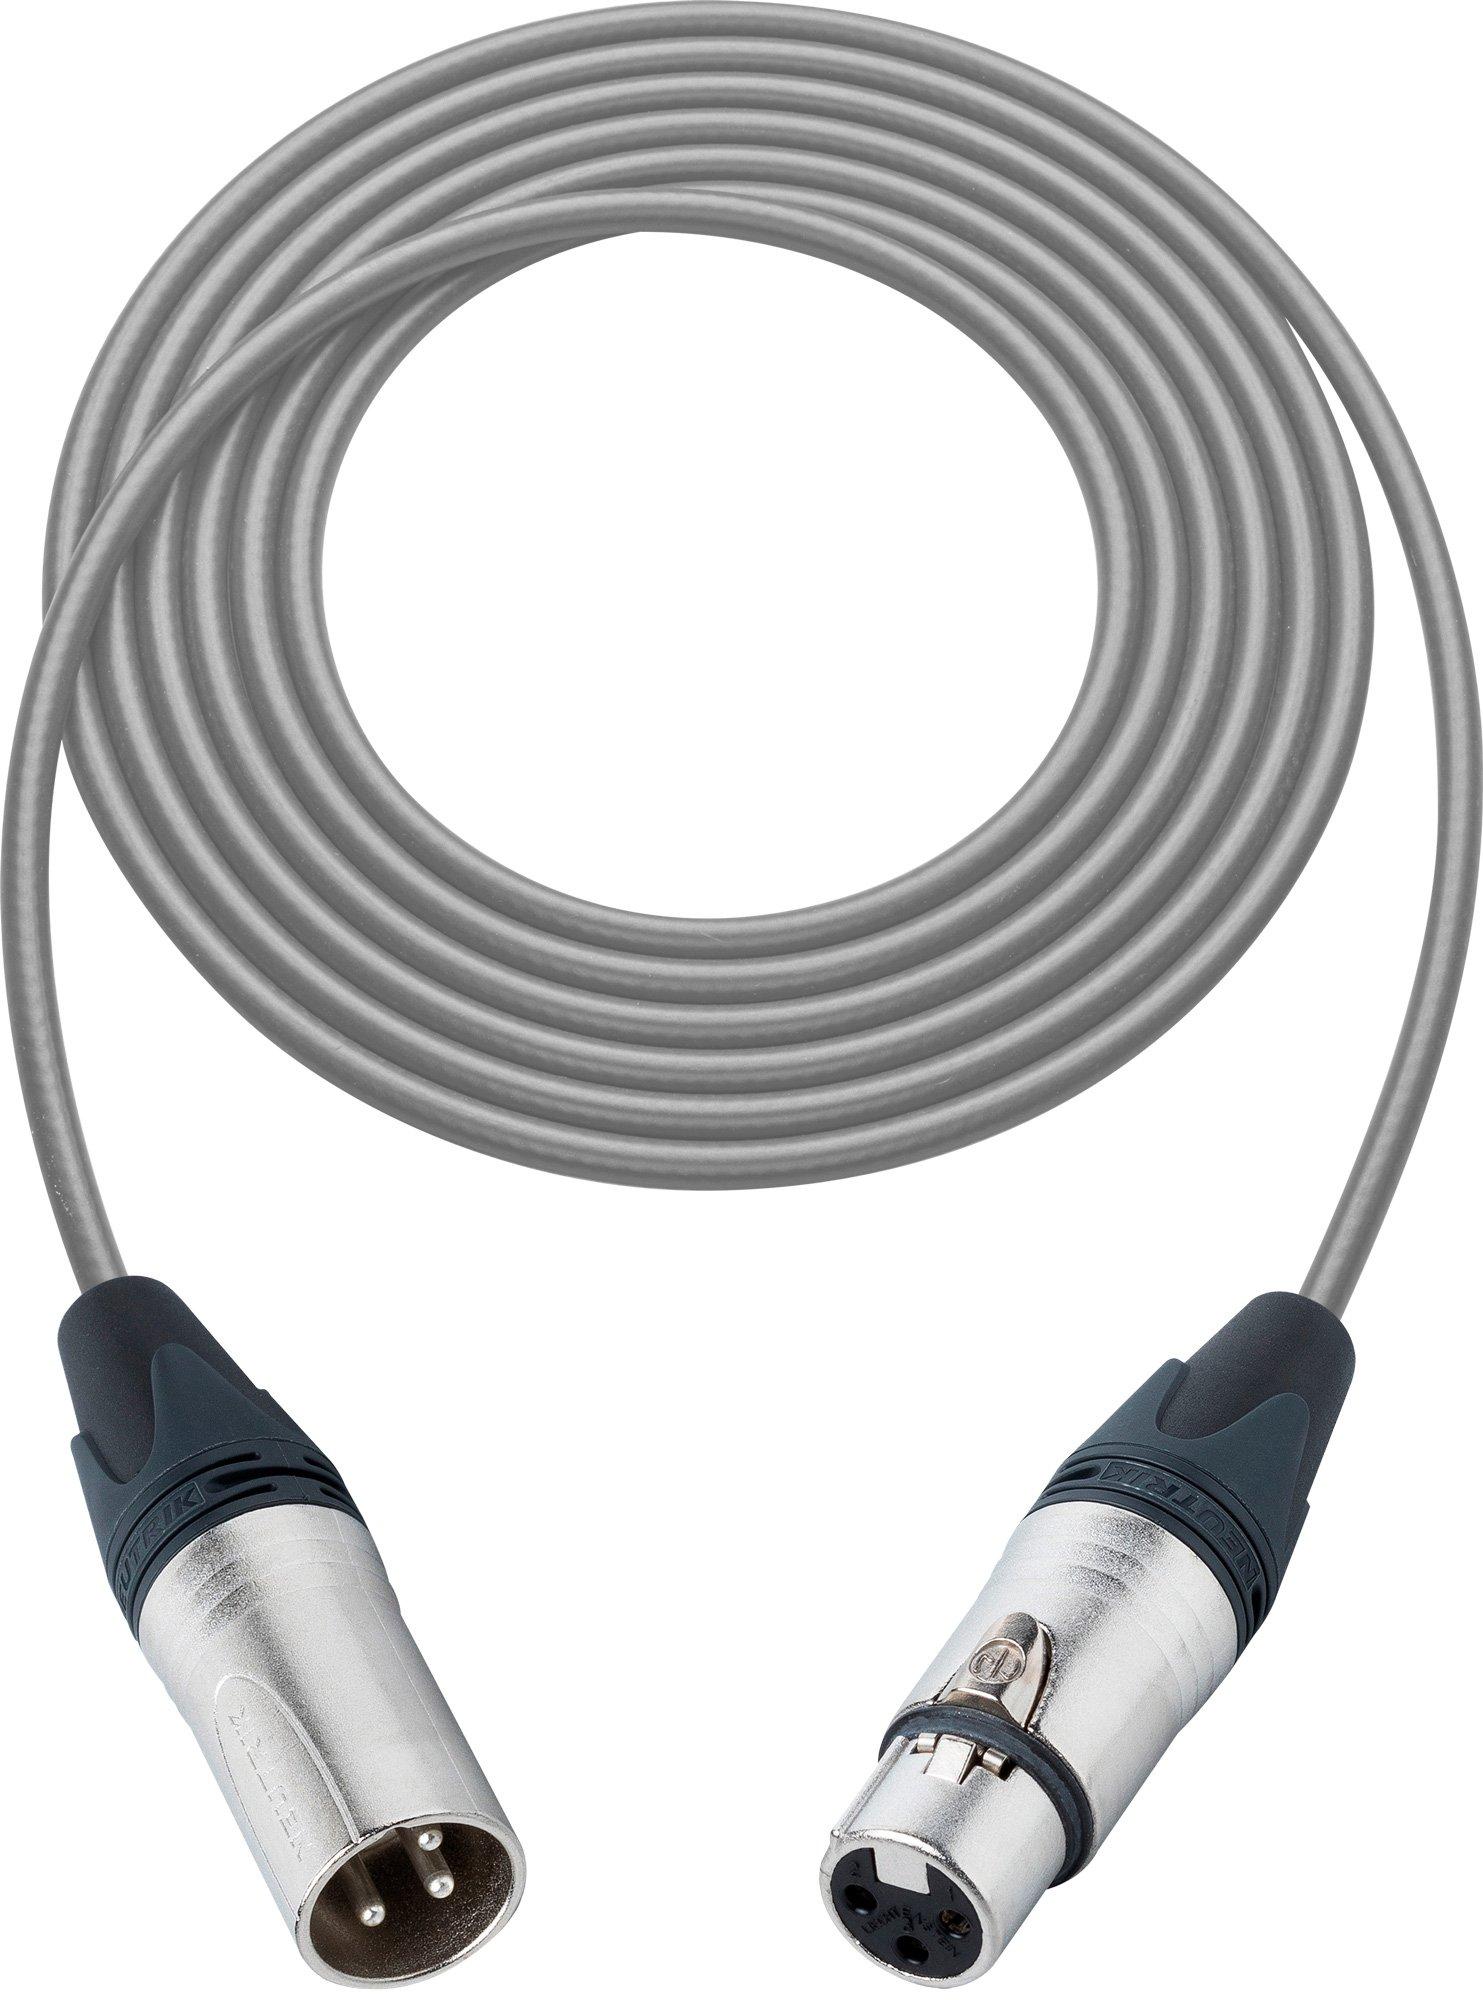 Pro Stage Series XLR Cable - 75 feet GREY L2-75XXJGY